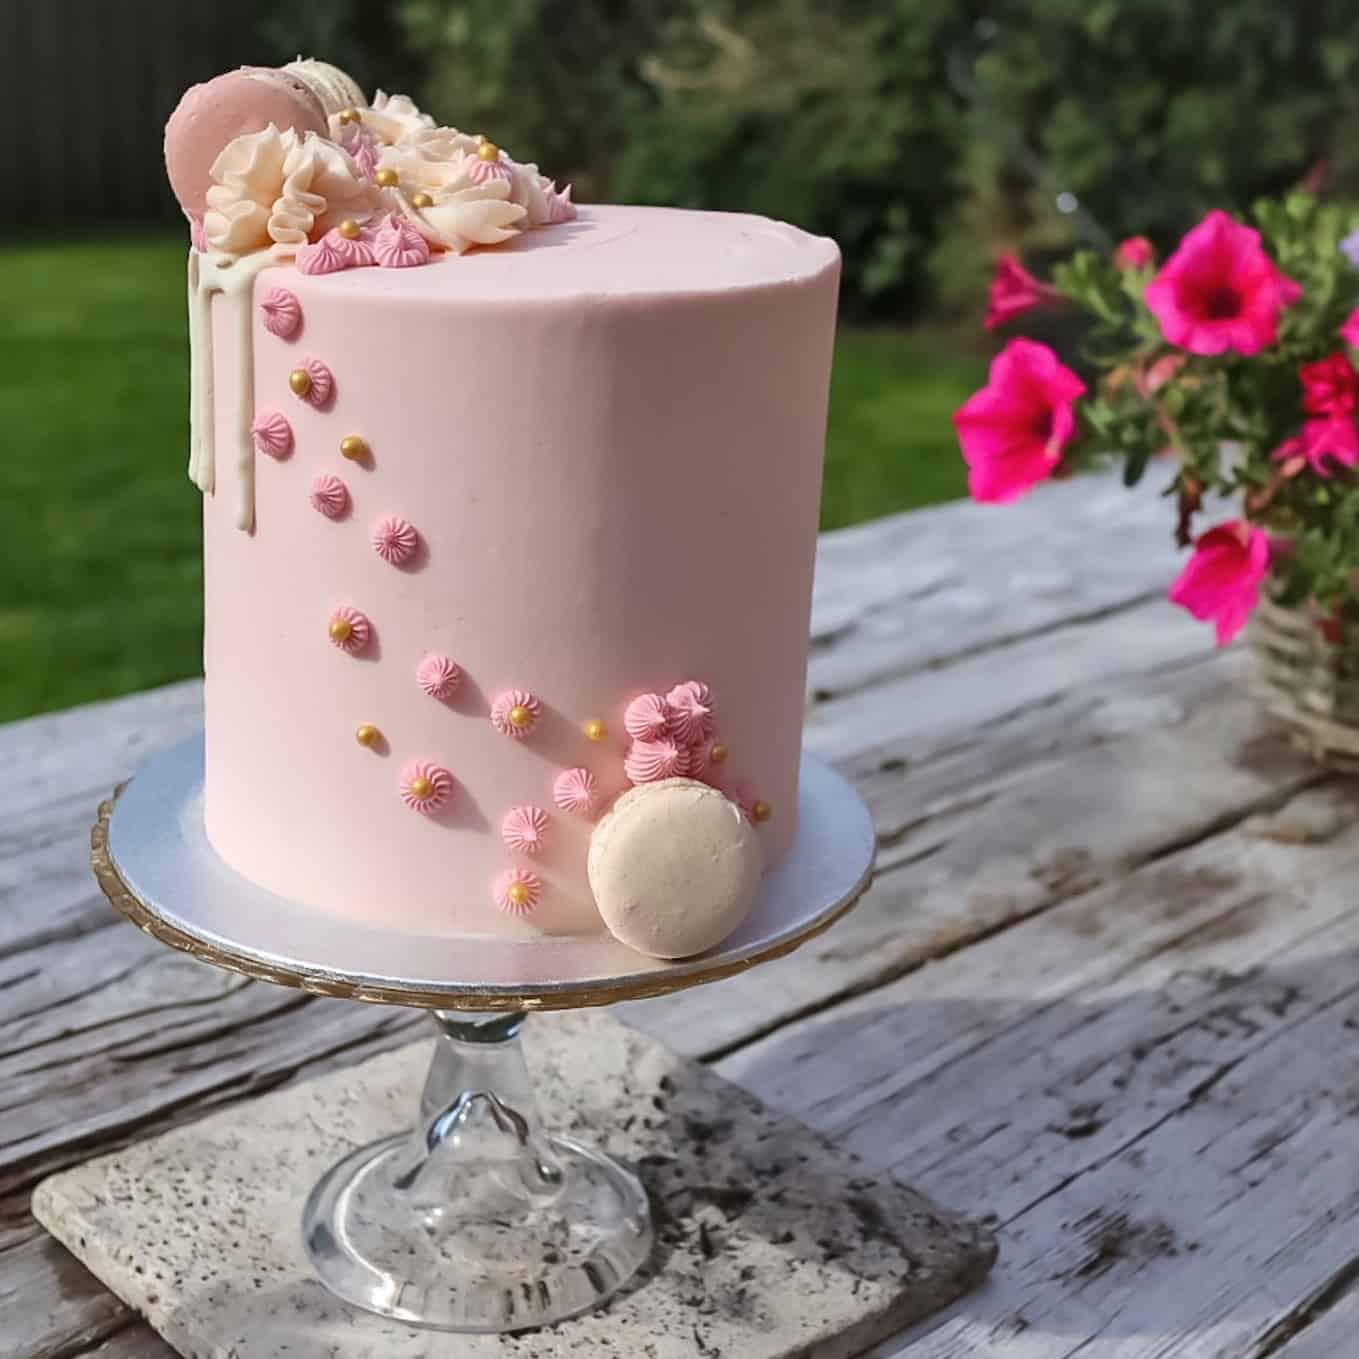 Tiffany 8″ Cake Gallery Image